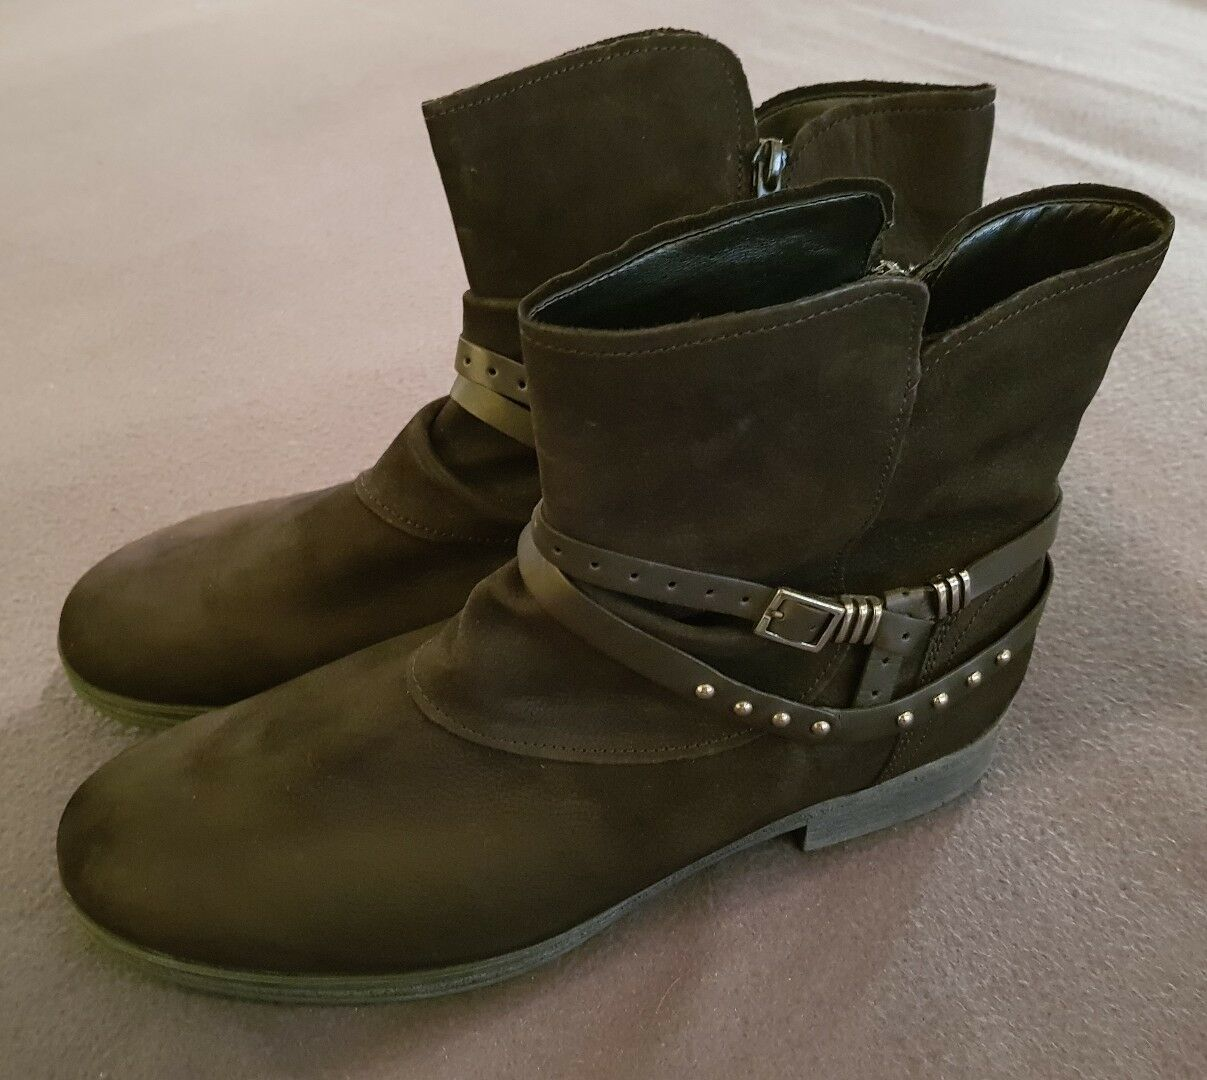 gabor stiefelette, Stiefel, Boots 42